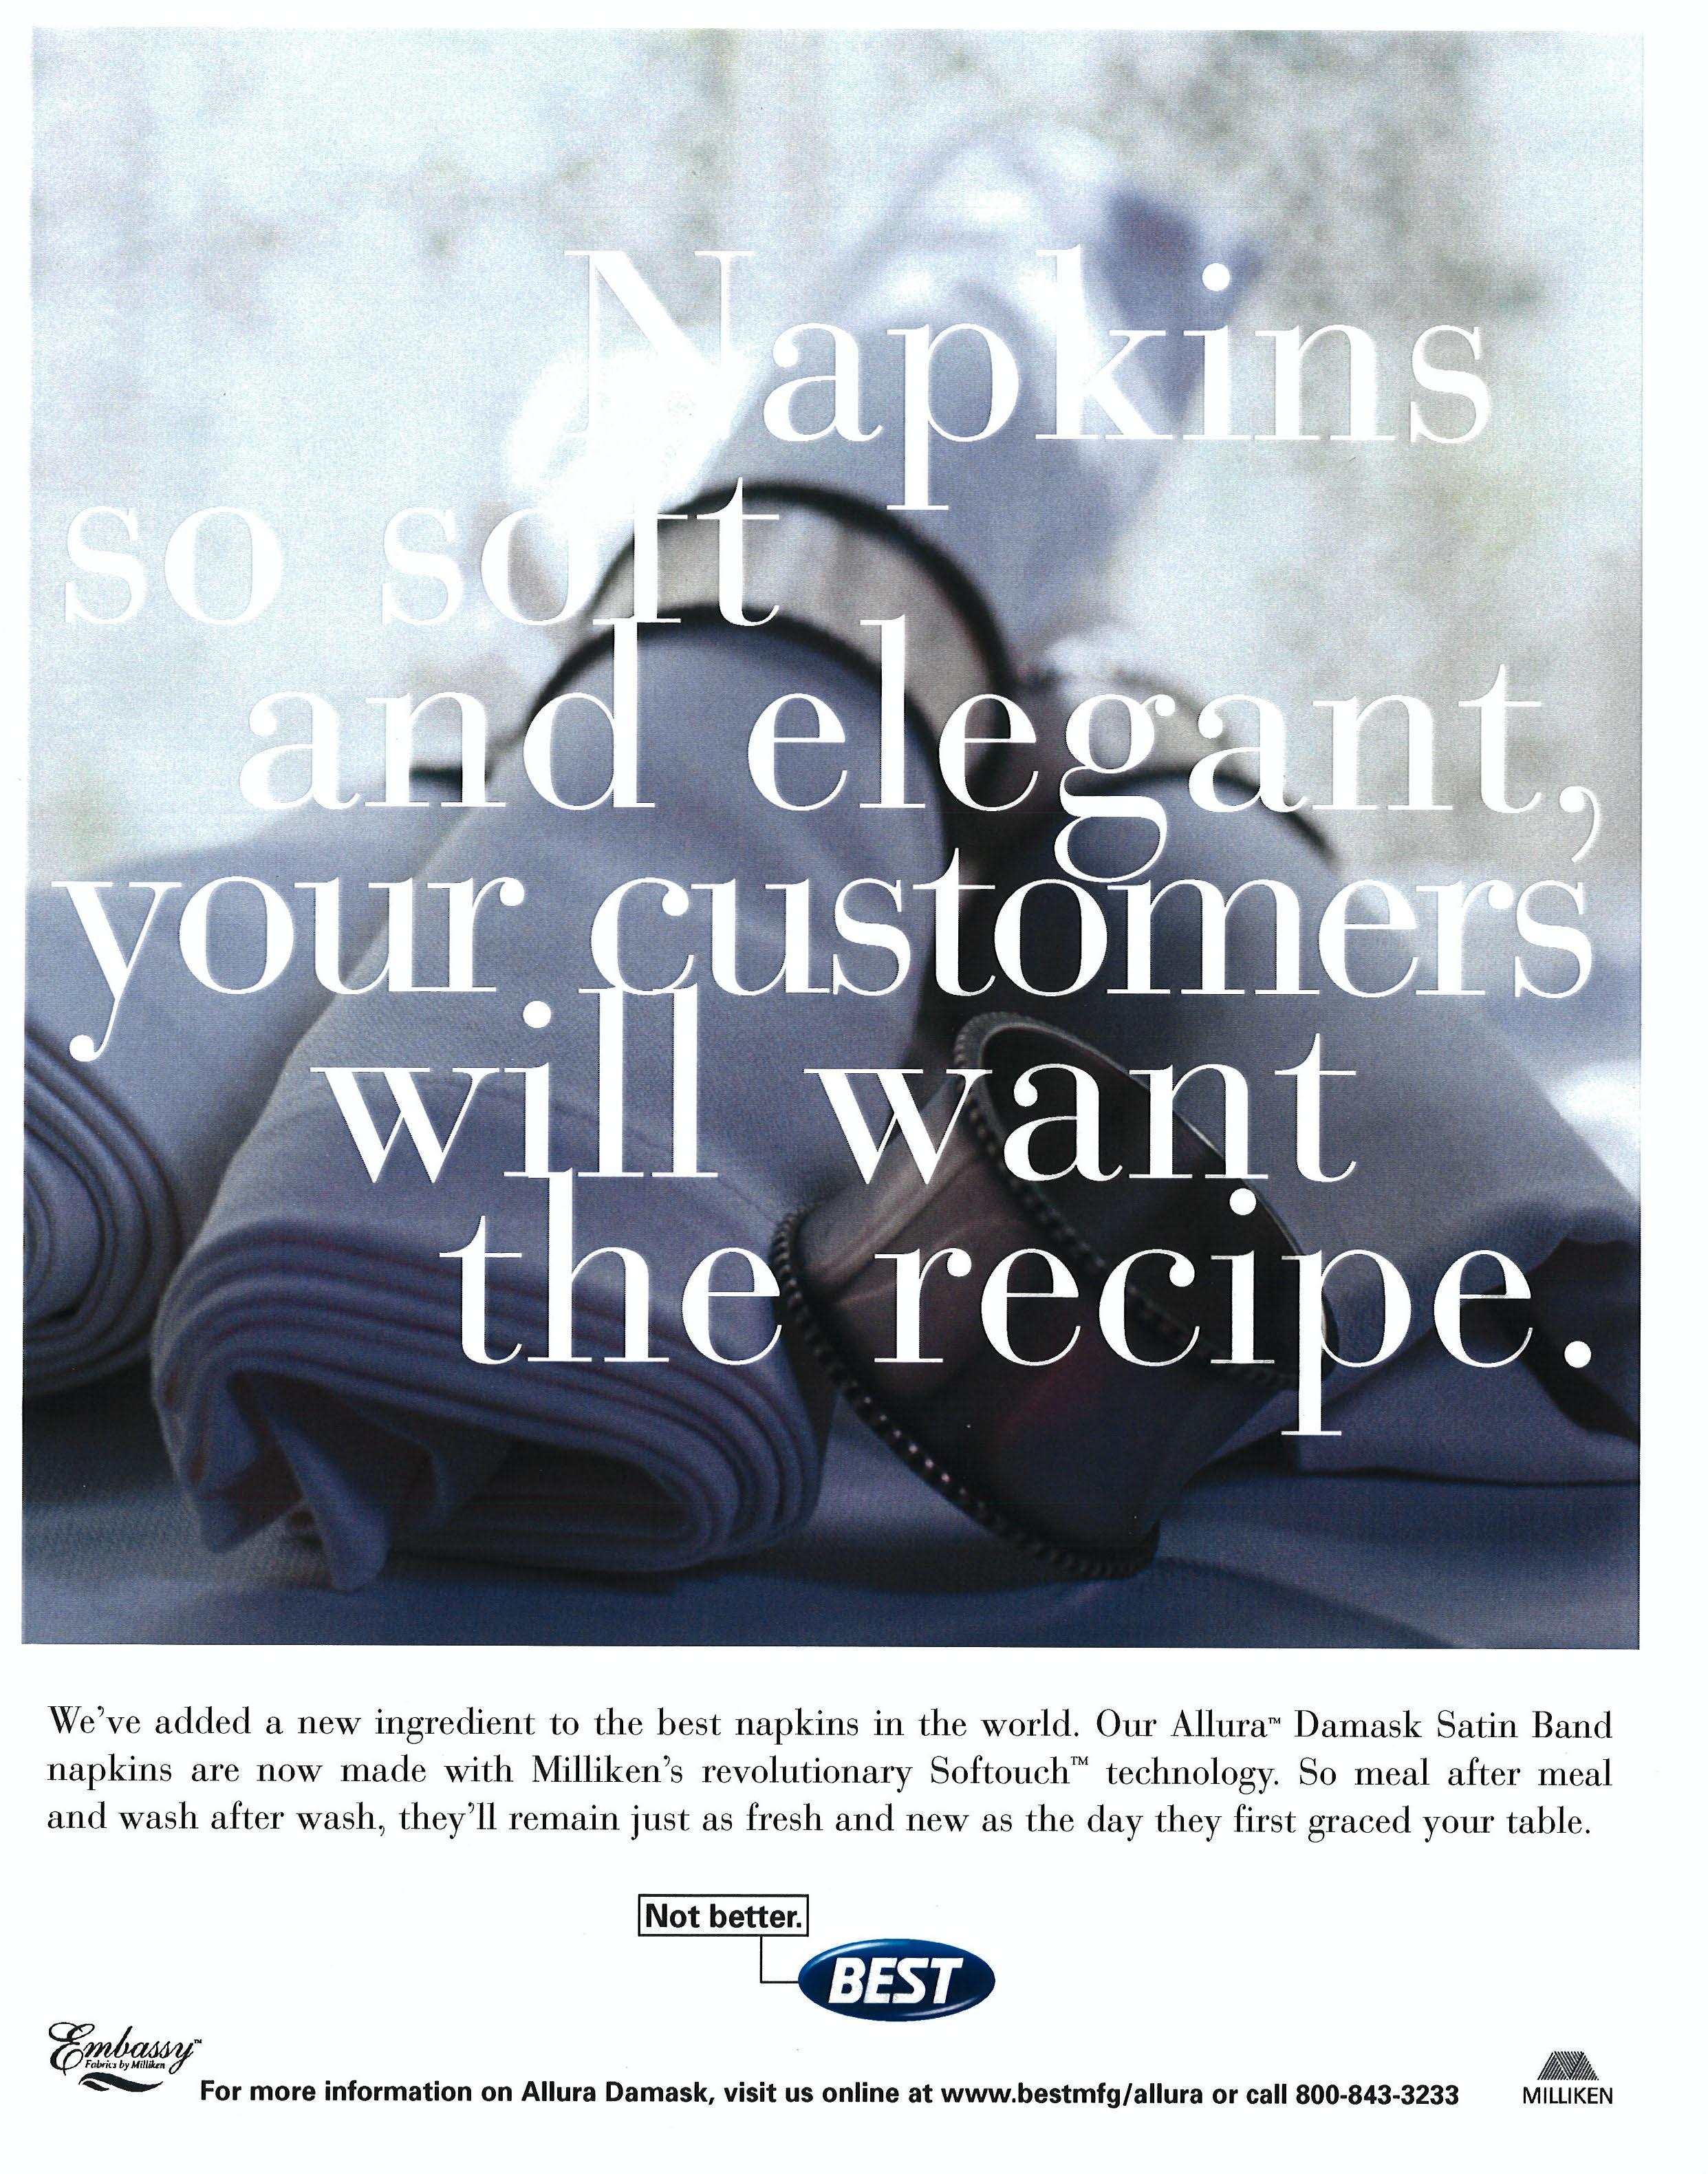 Best Napkins print ad.jpg